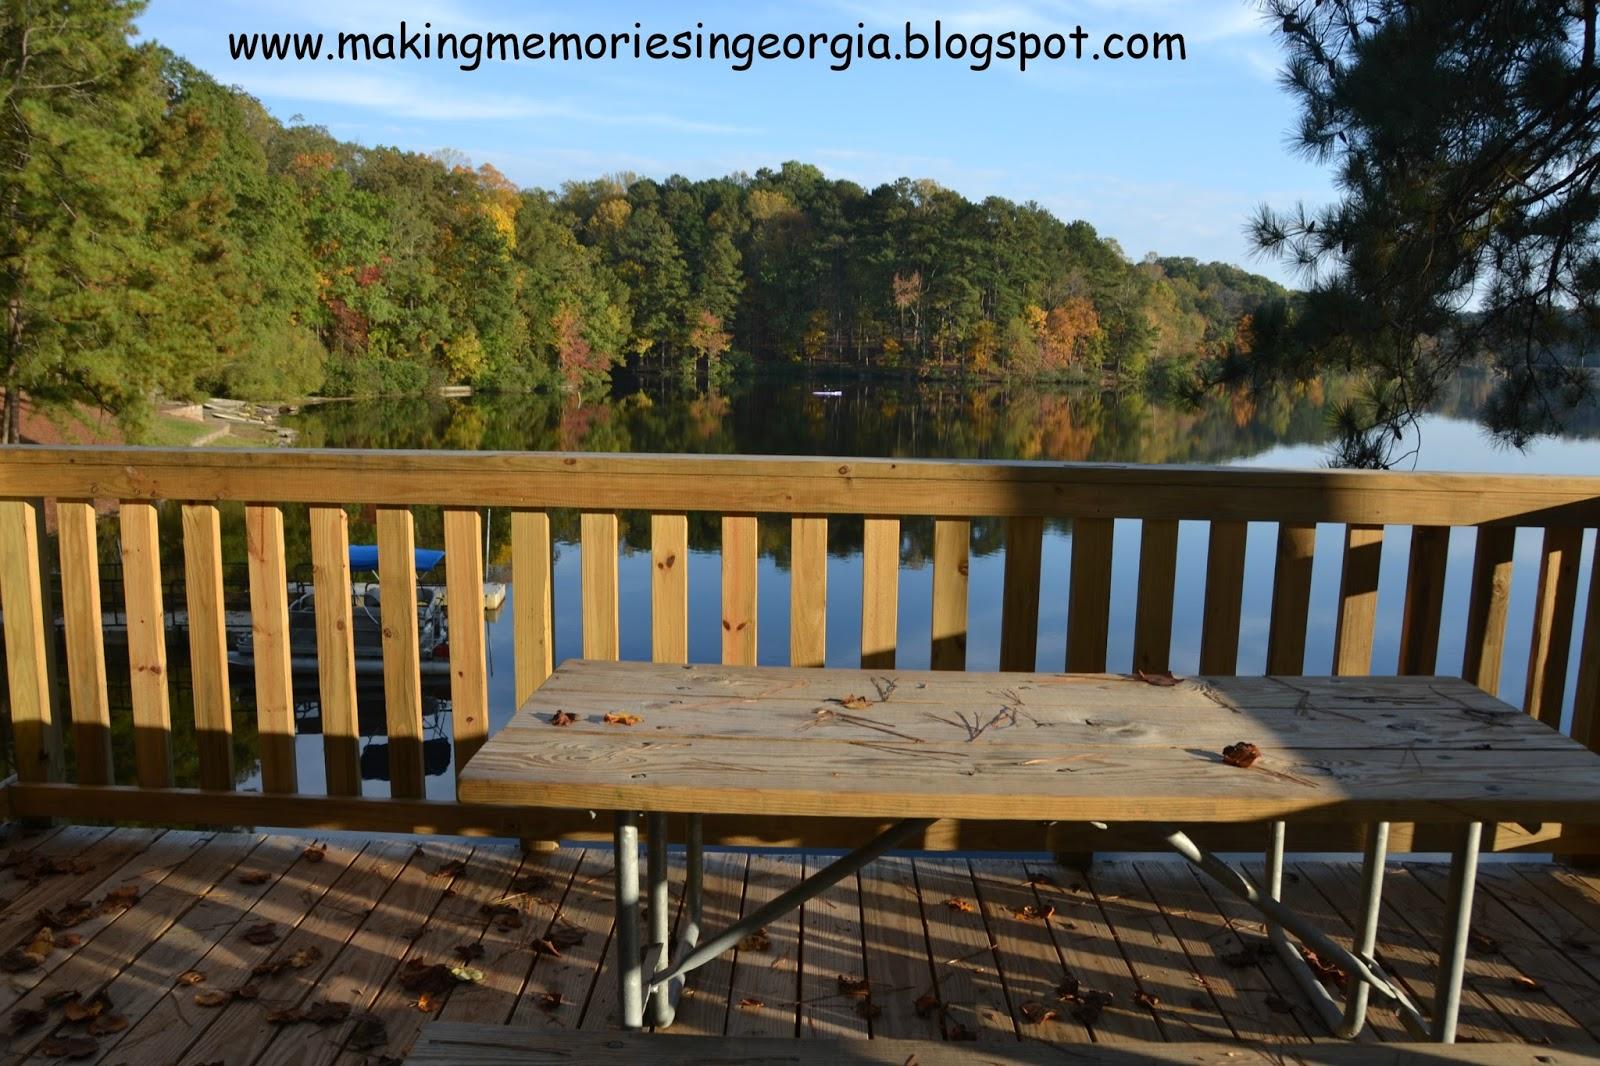 Making Memories in Georgia!: Camping at Stone Mountain in ...